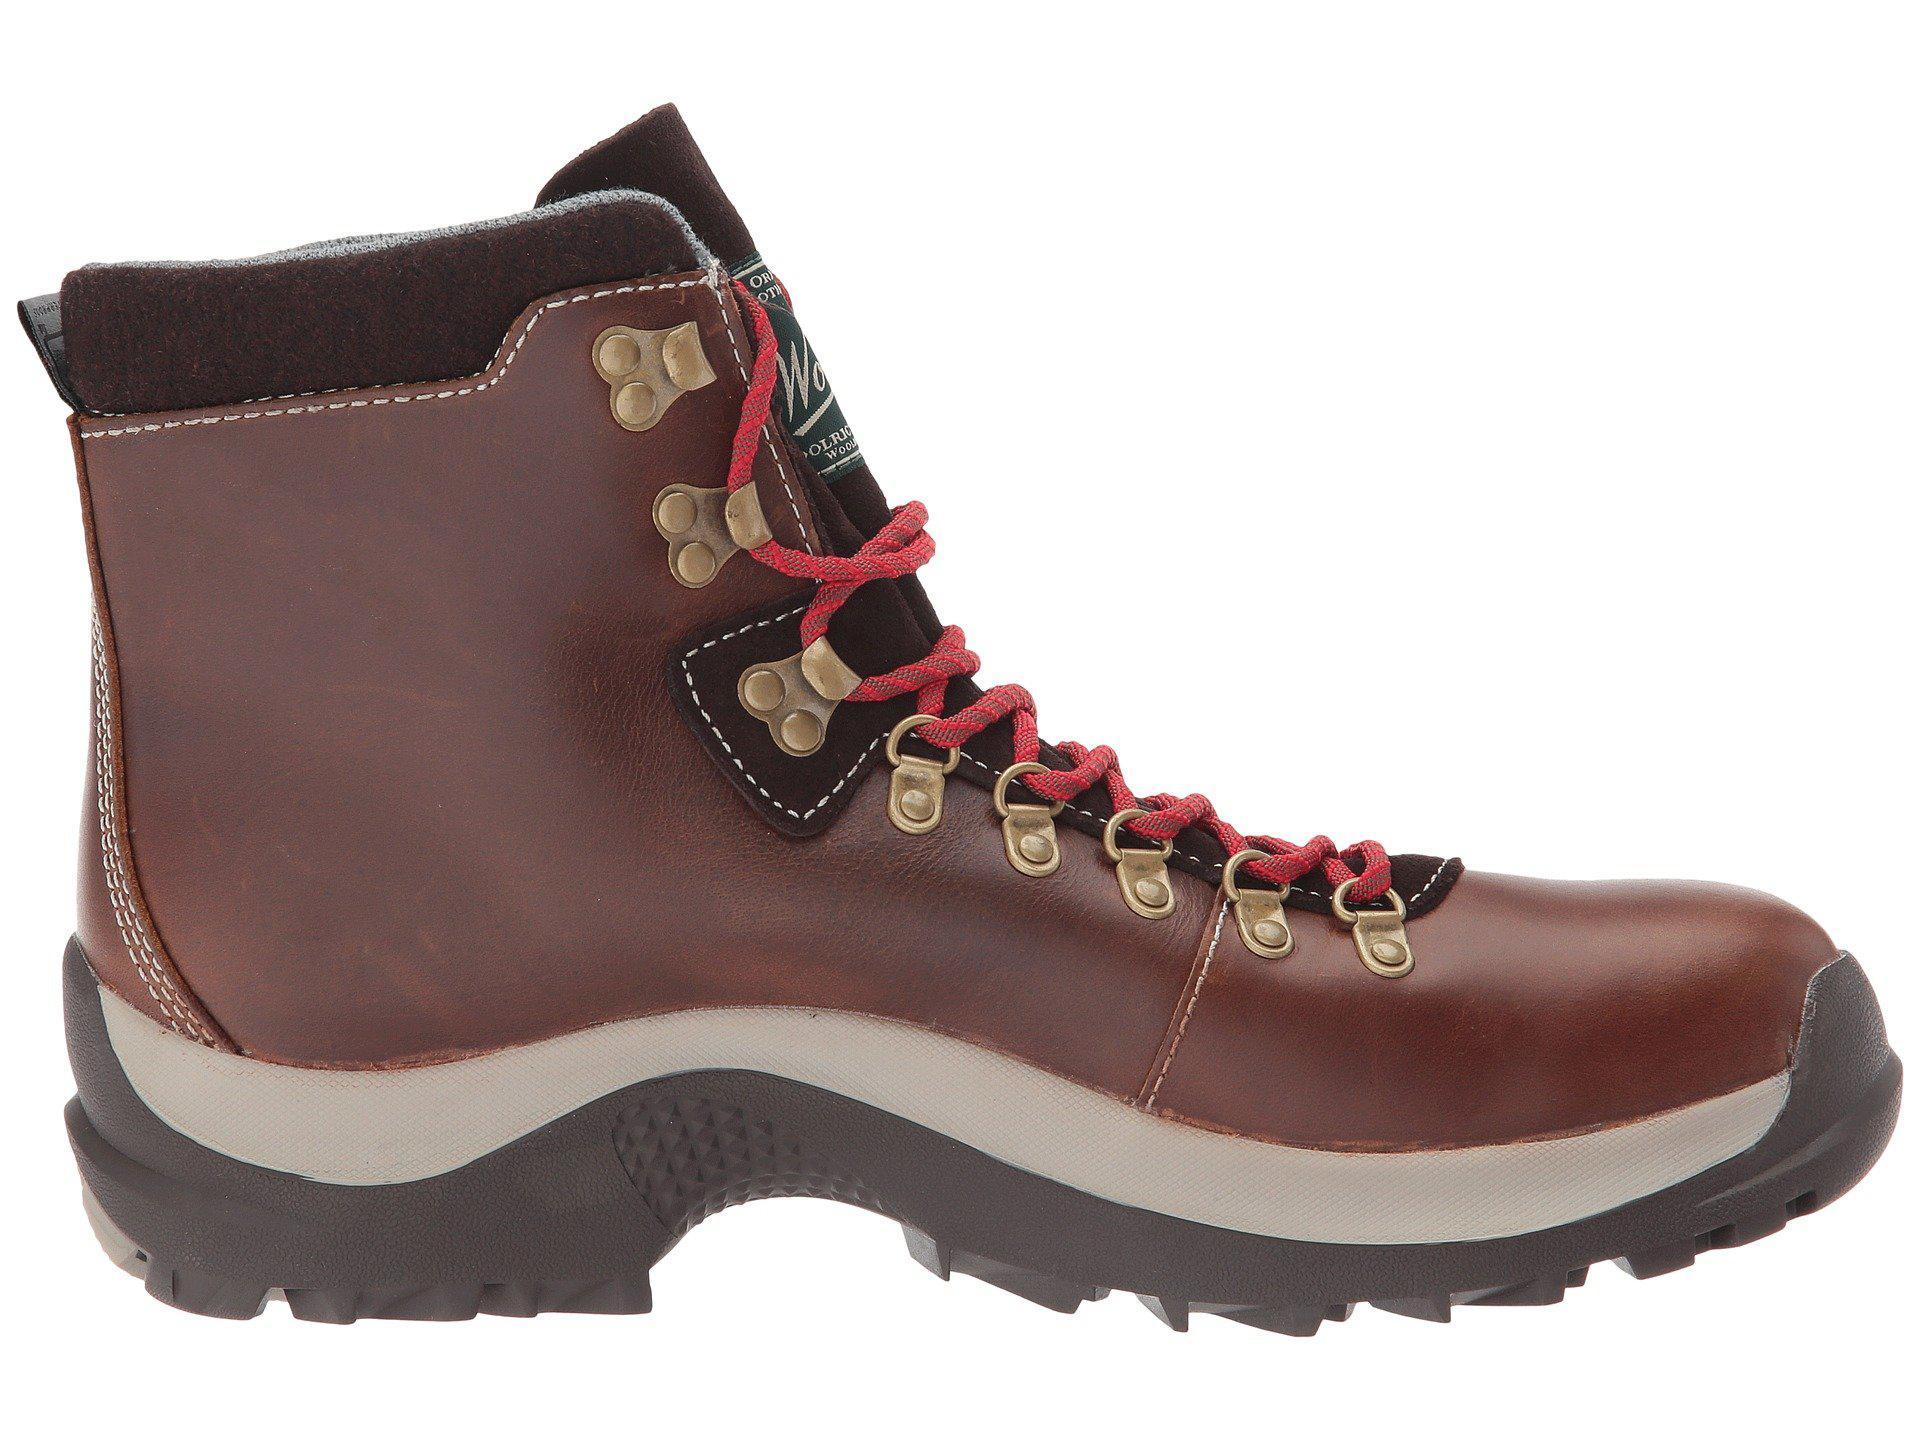 Woolrich Wool Trail Stomper Winter Boot